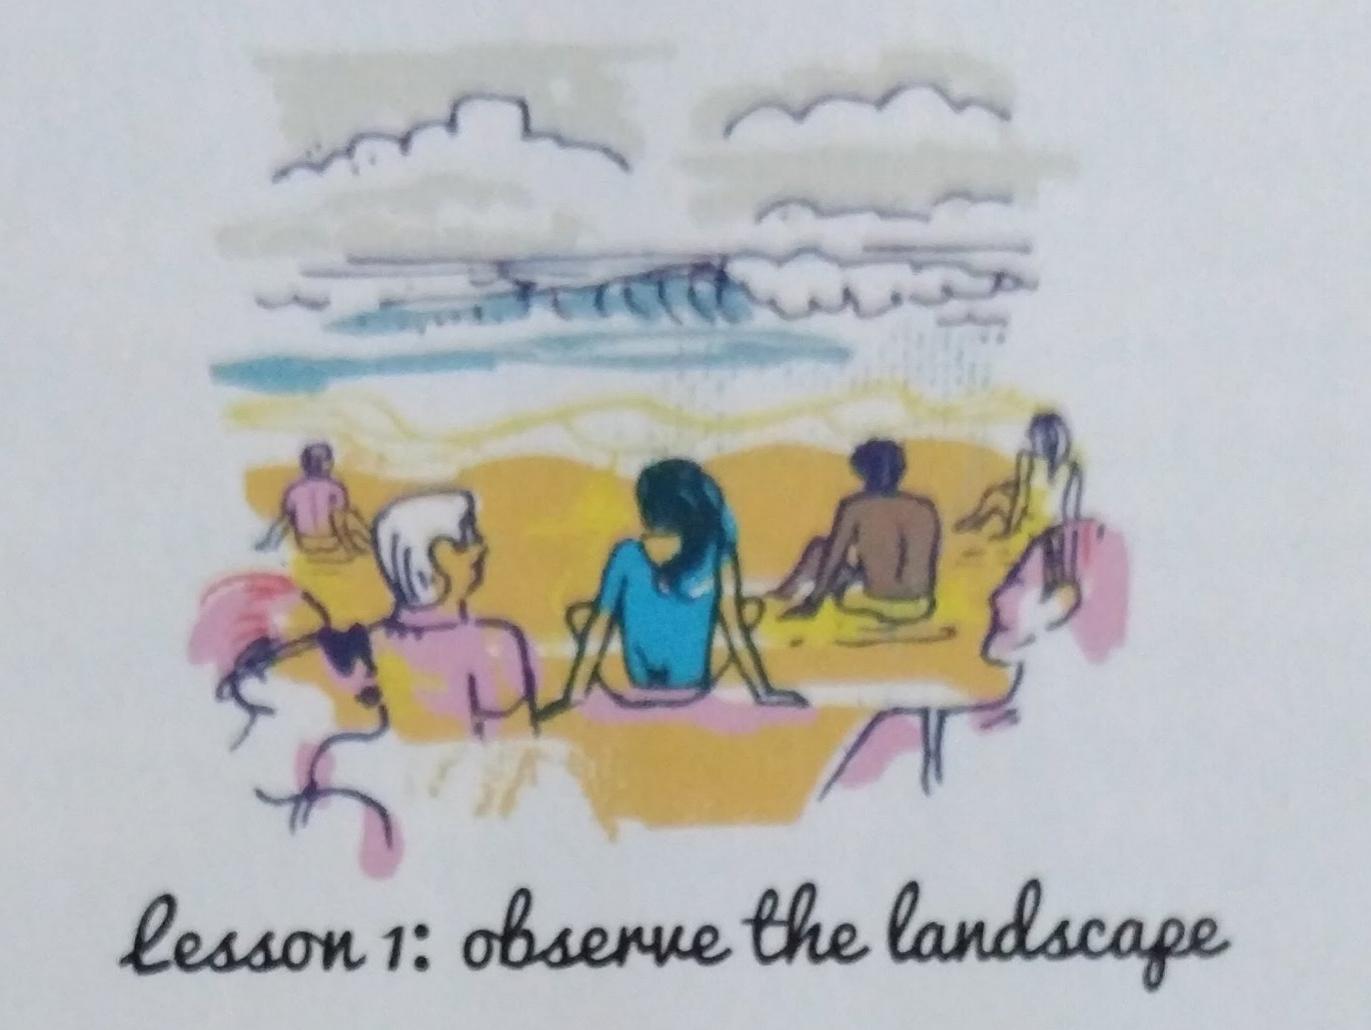 Lesson 1 Observe the Landscape